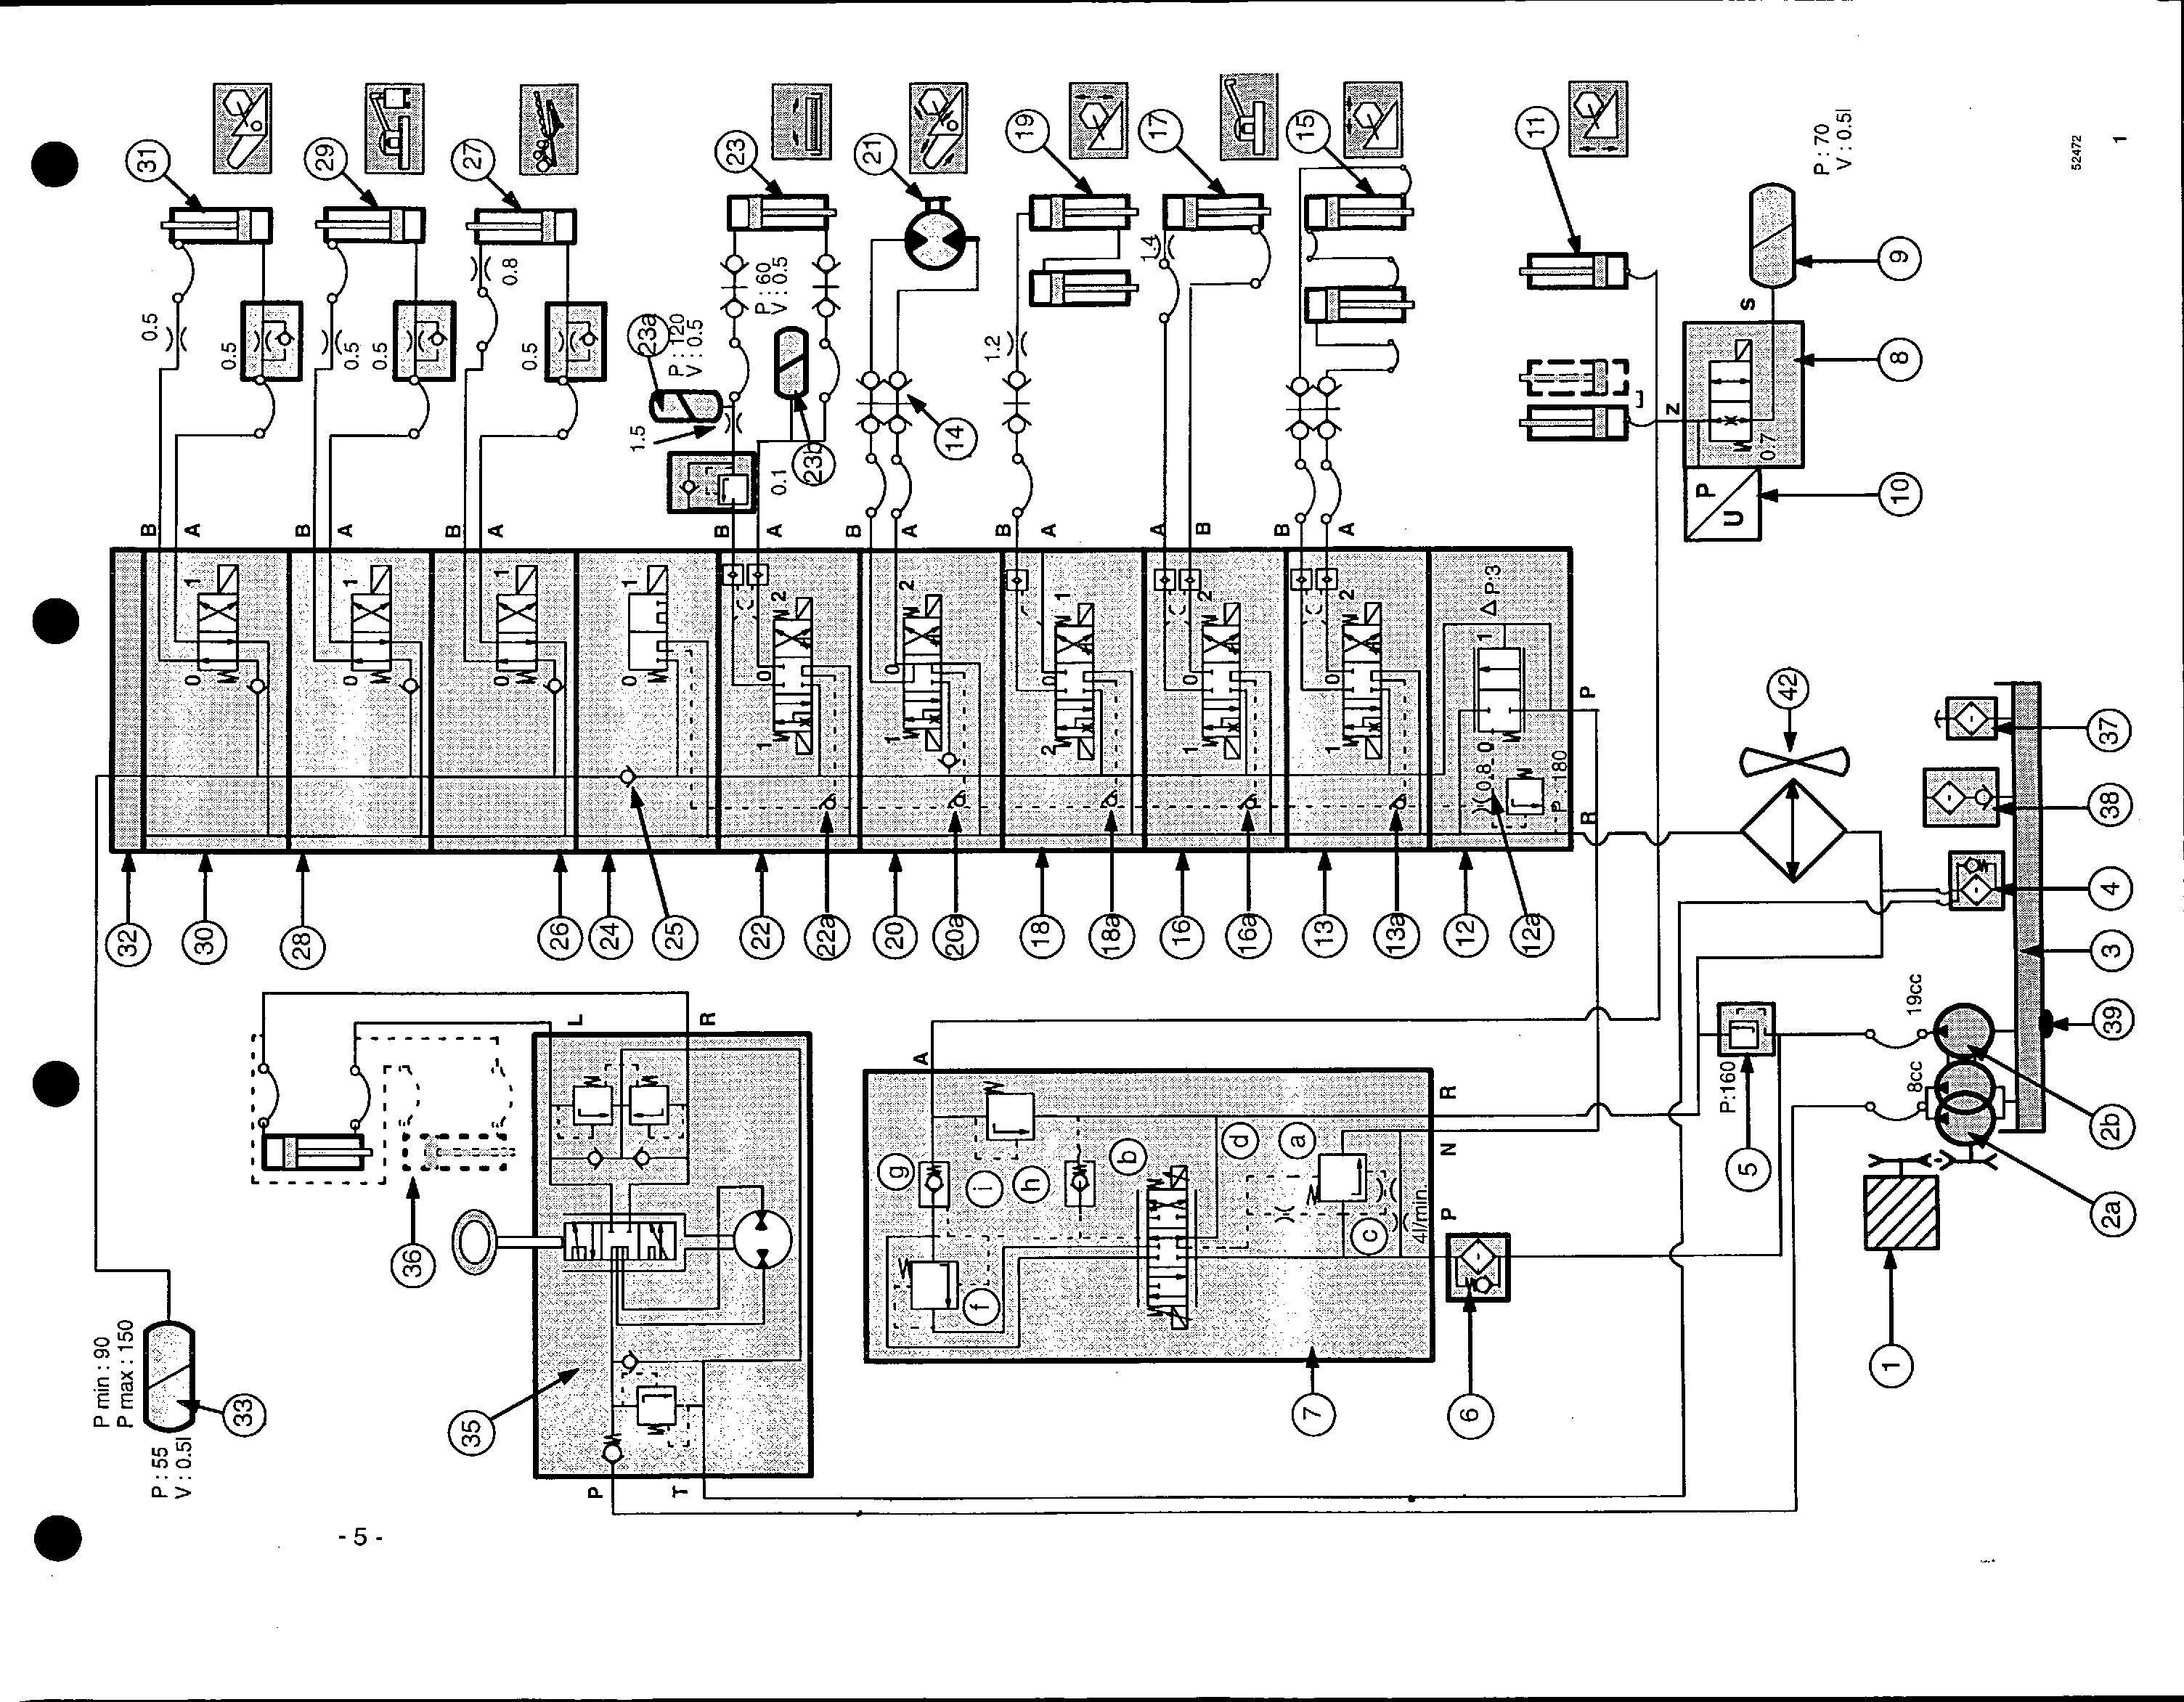 New Holland TF76, TF78 Combine Service Manual - 2